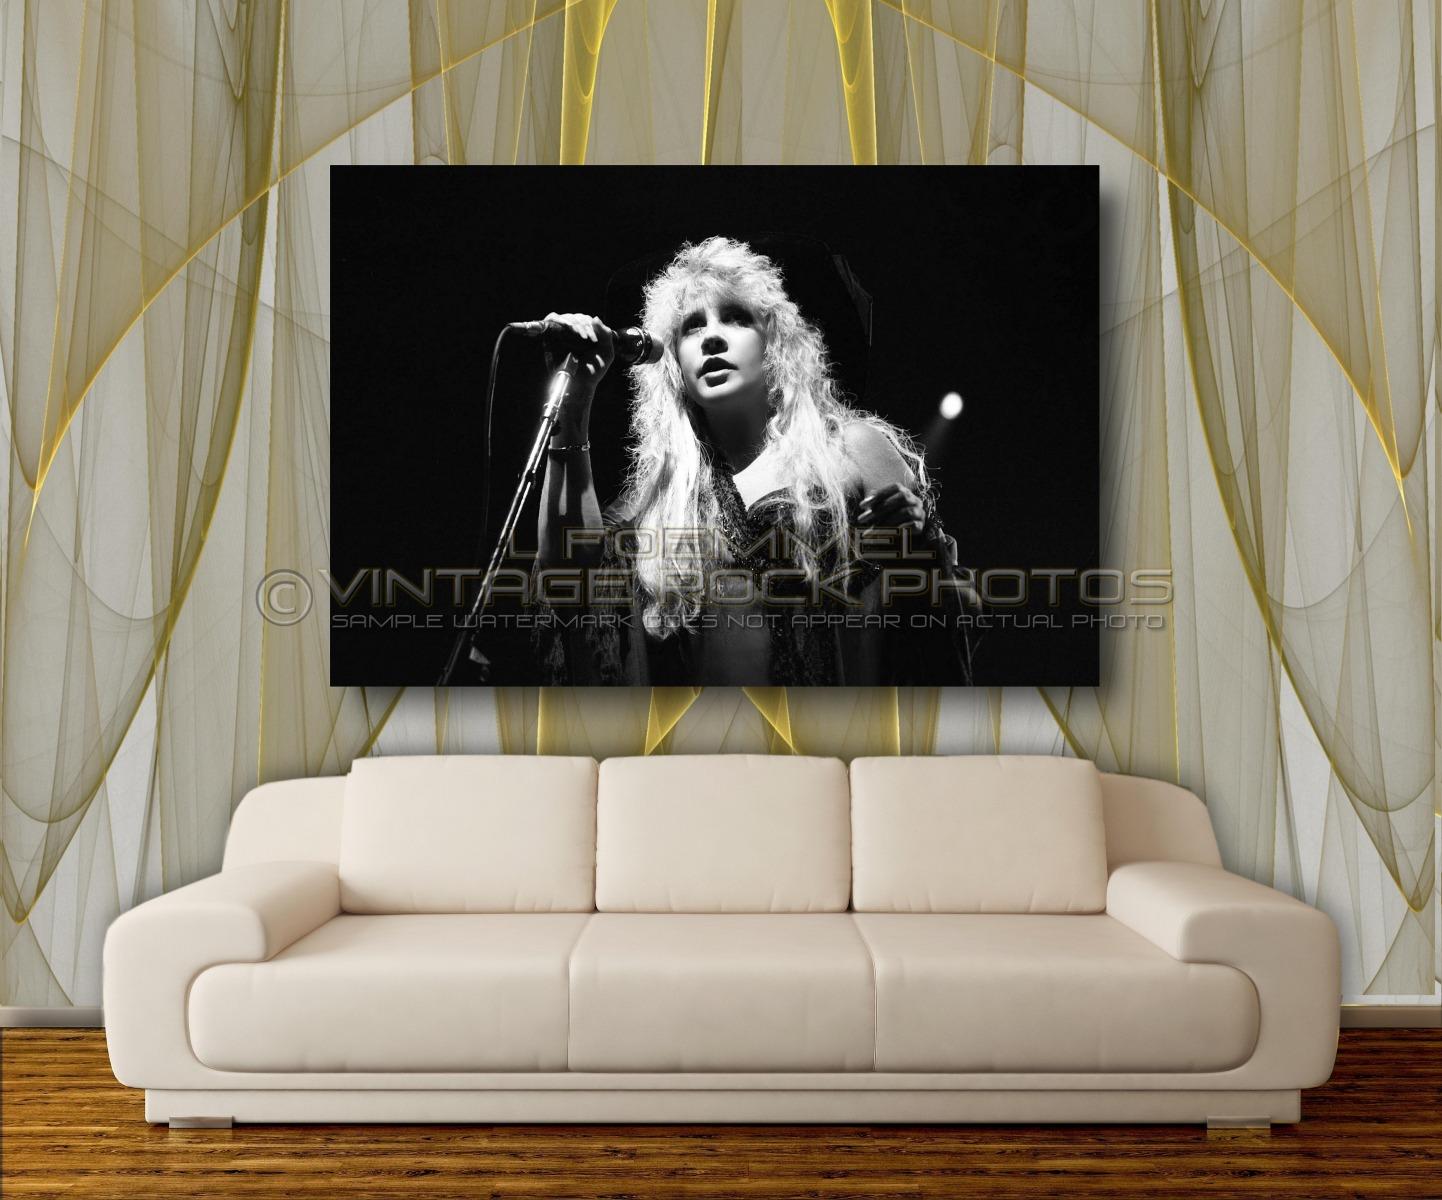 Stevie Nicks Poster Fleetwood MAC 20x30 Ph